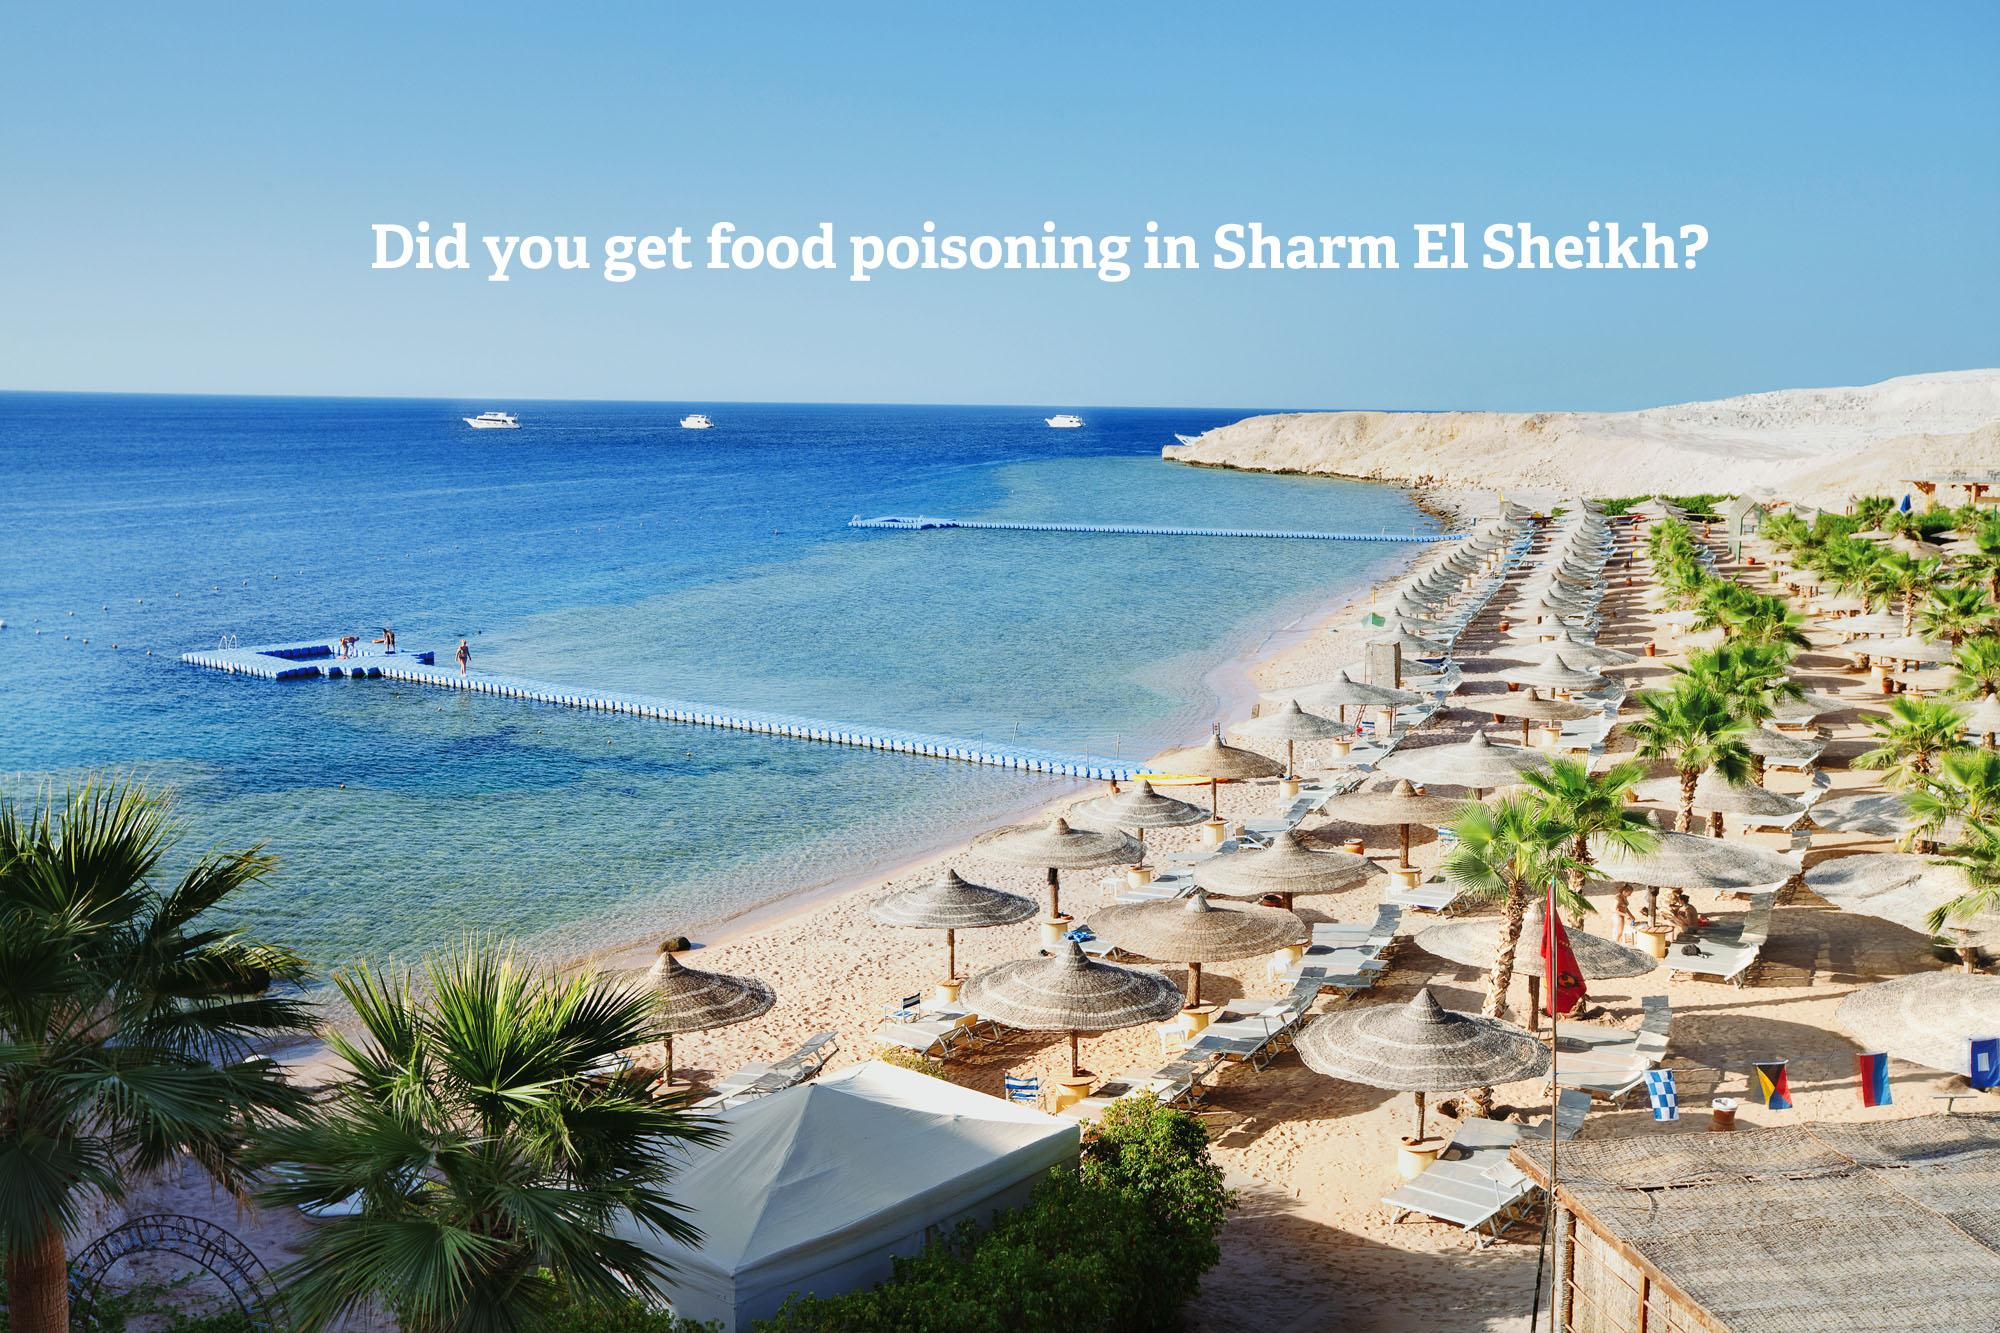 foodpoisoning_sharm-el-sheikh